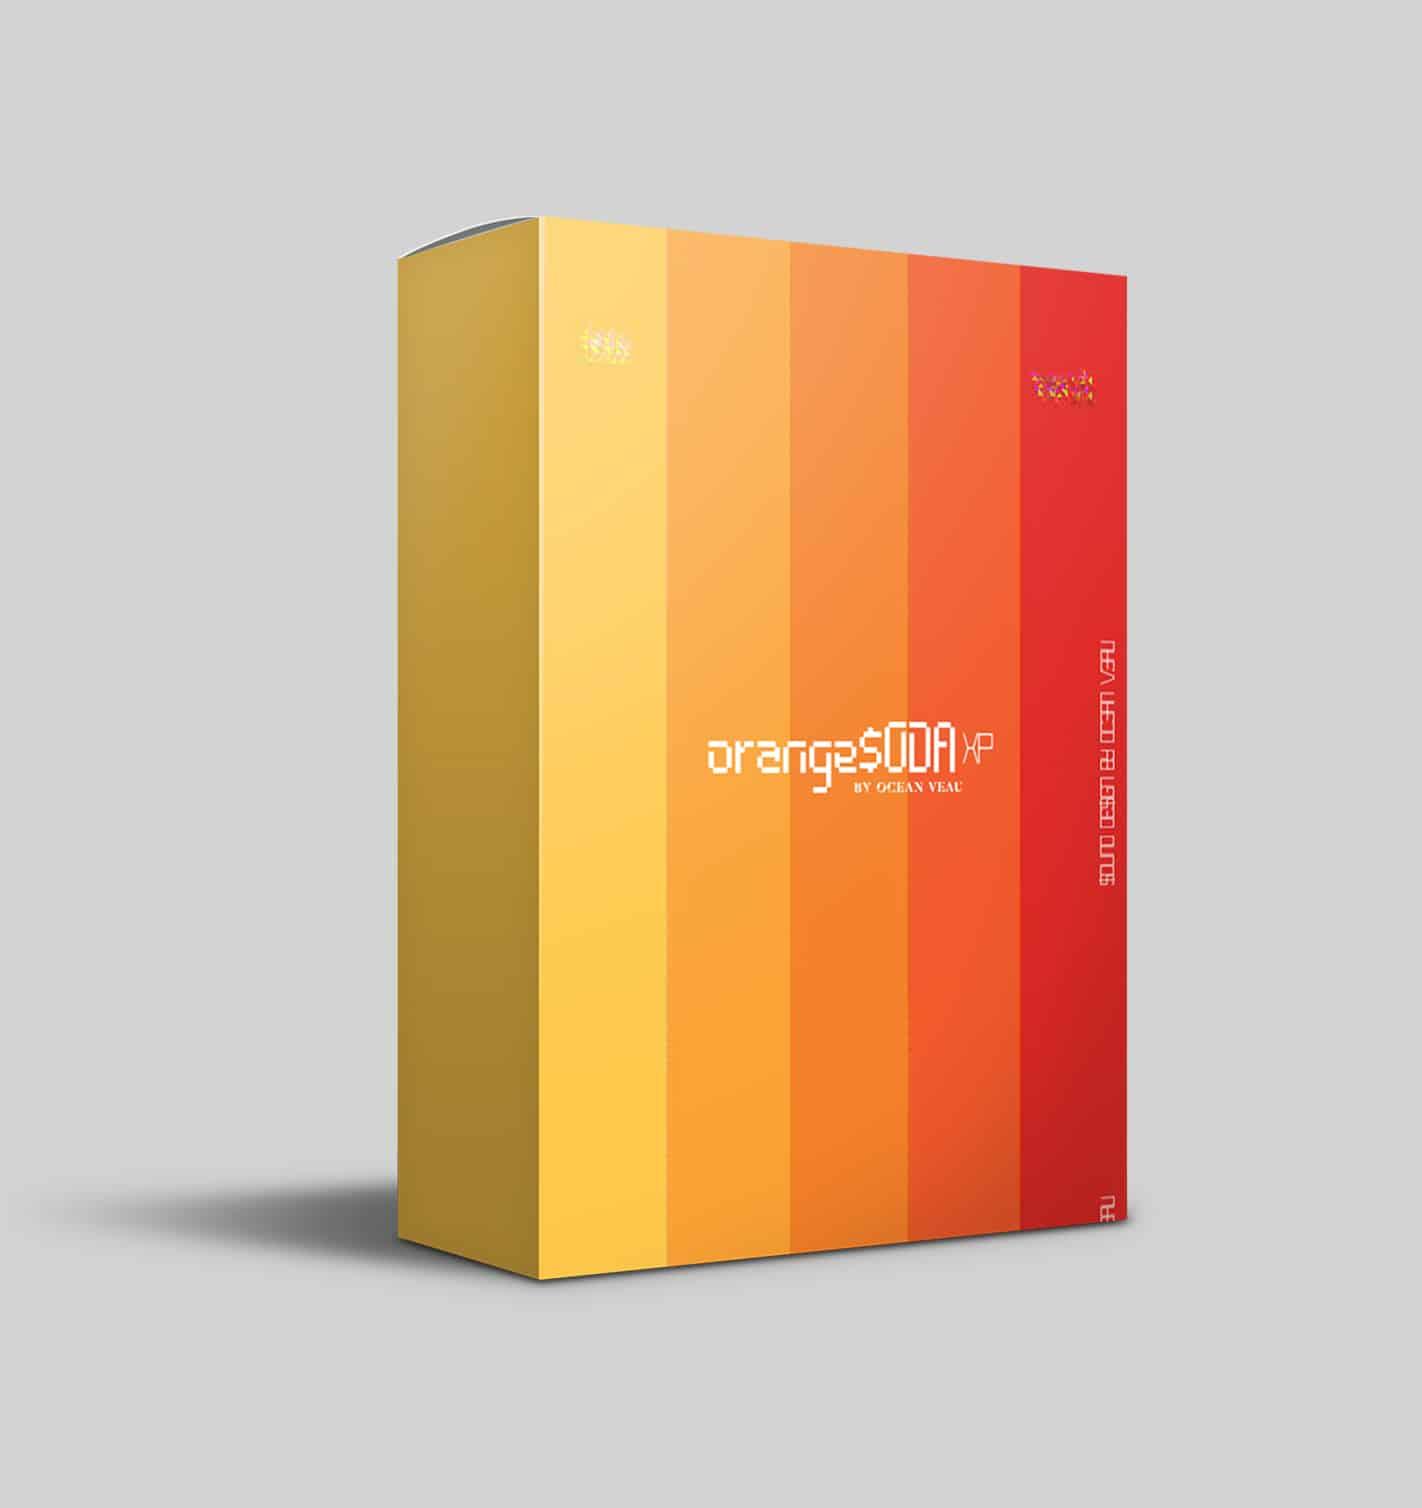 Ocean Veau - Orange $oda XP for ElectraX